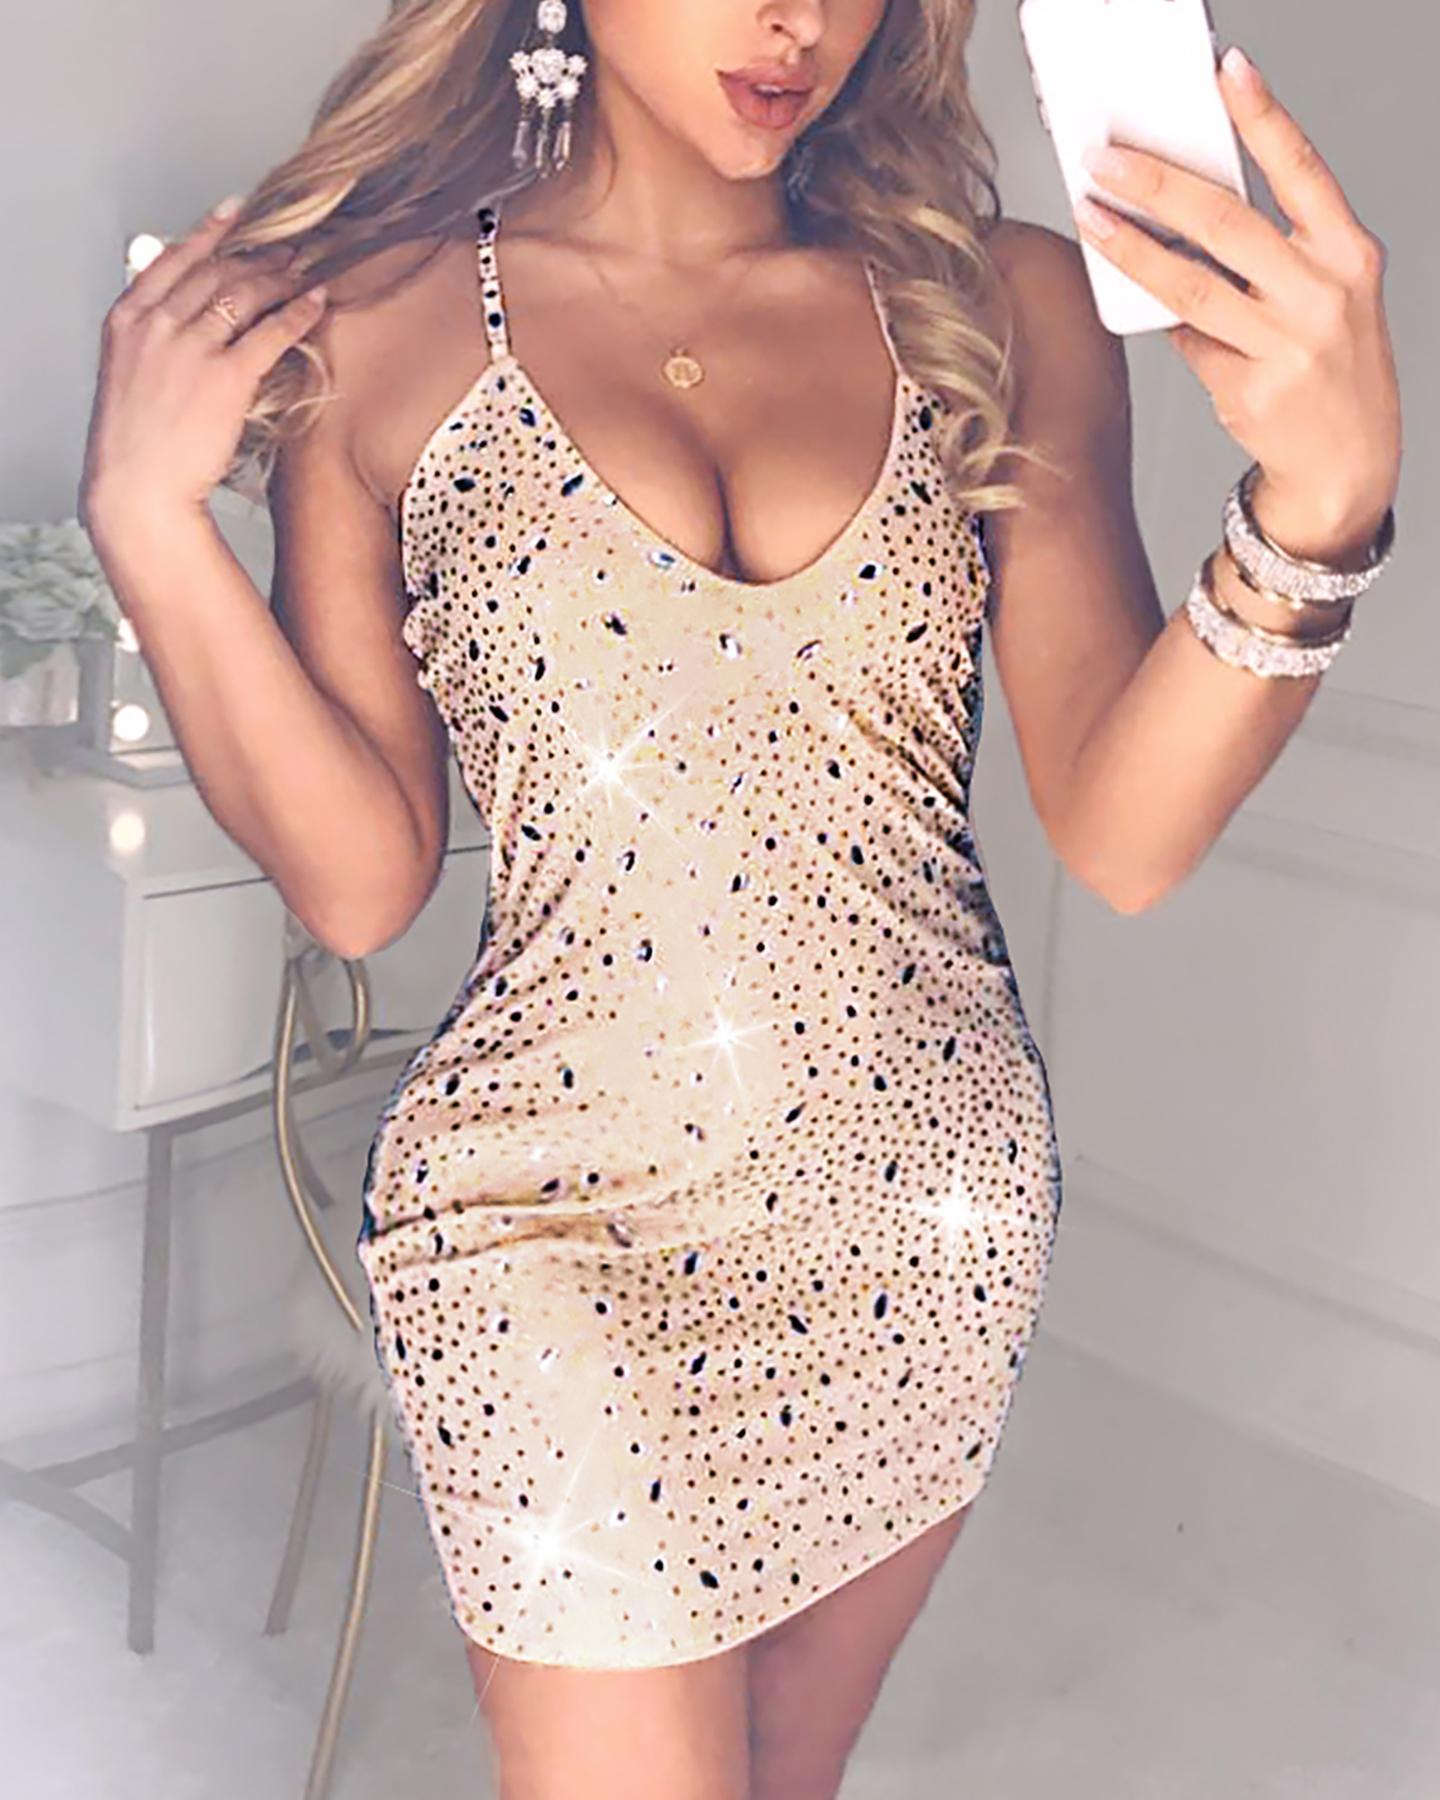 Studded Spaghetti Strap Crisscross Backless Dress фото